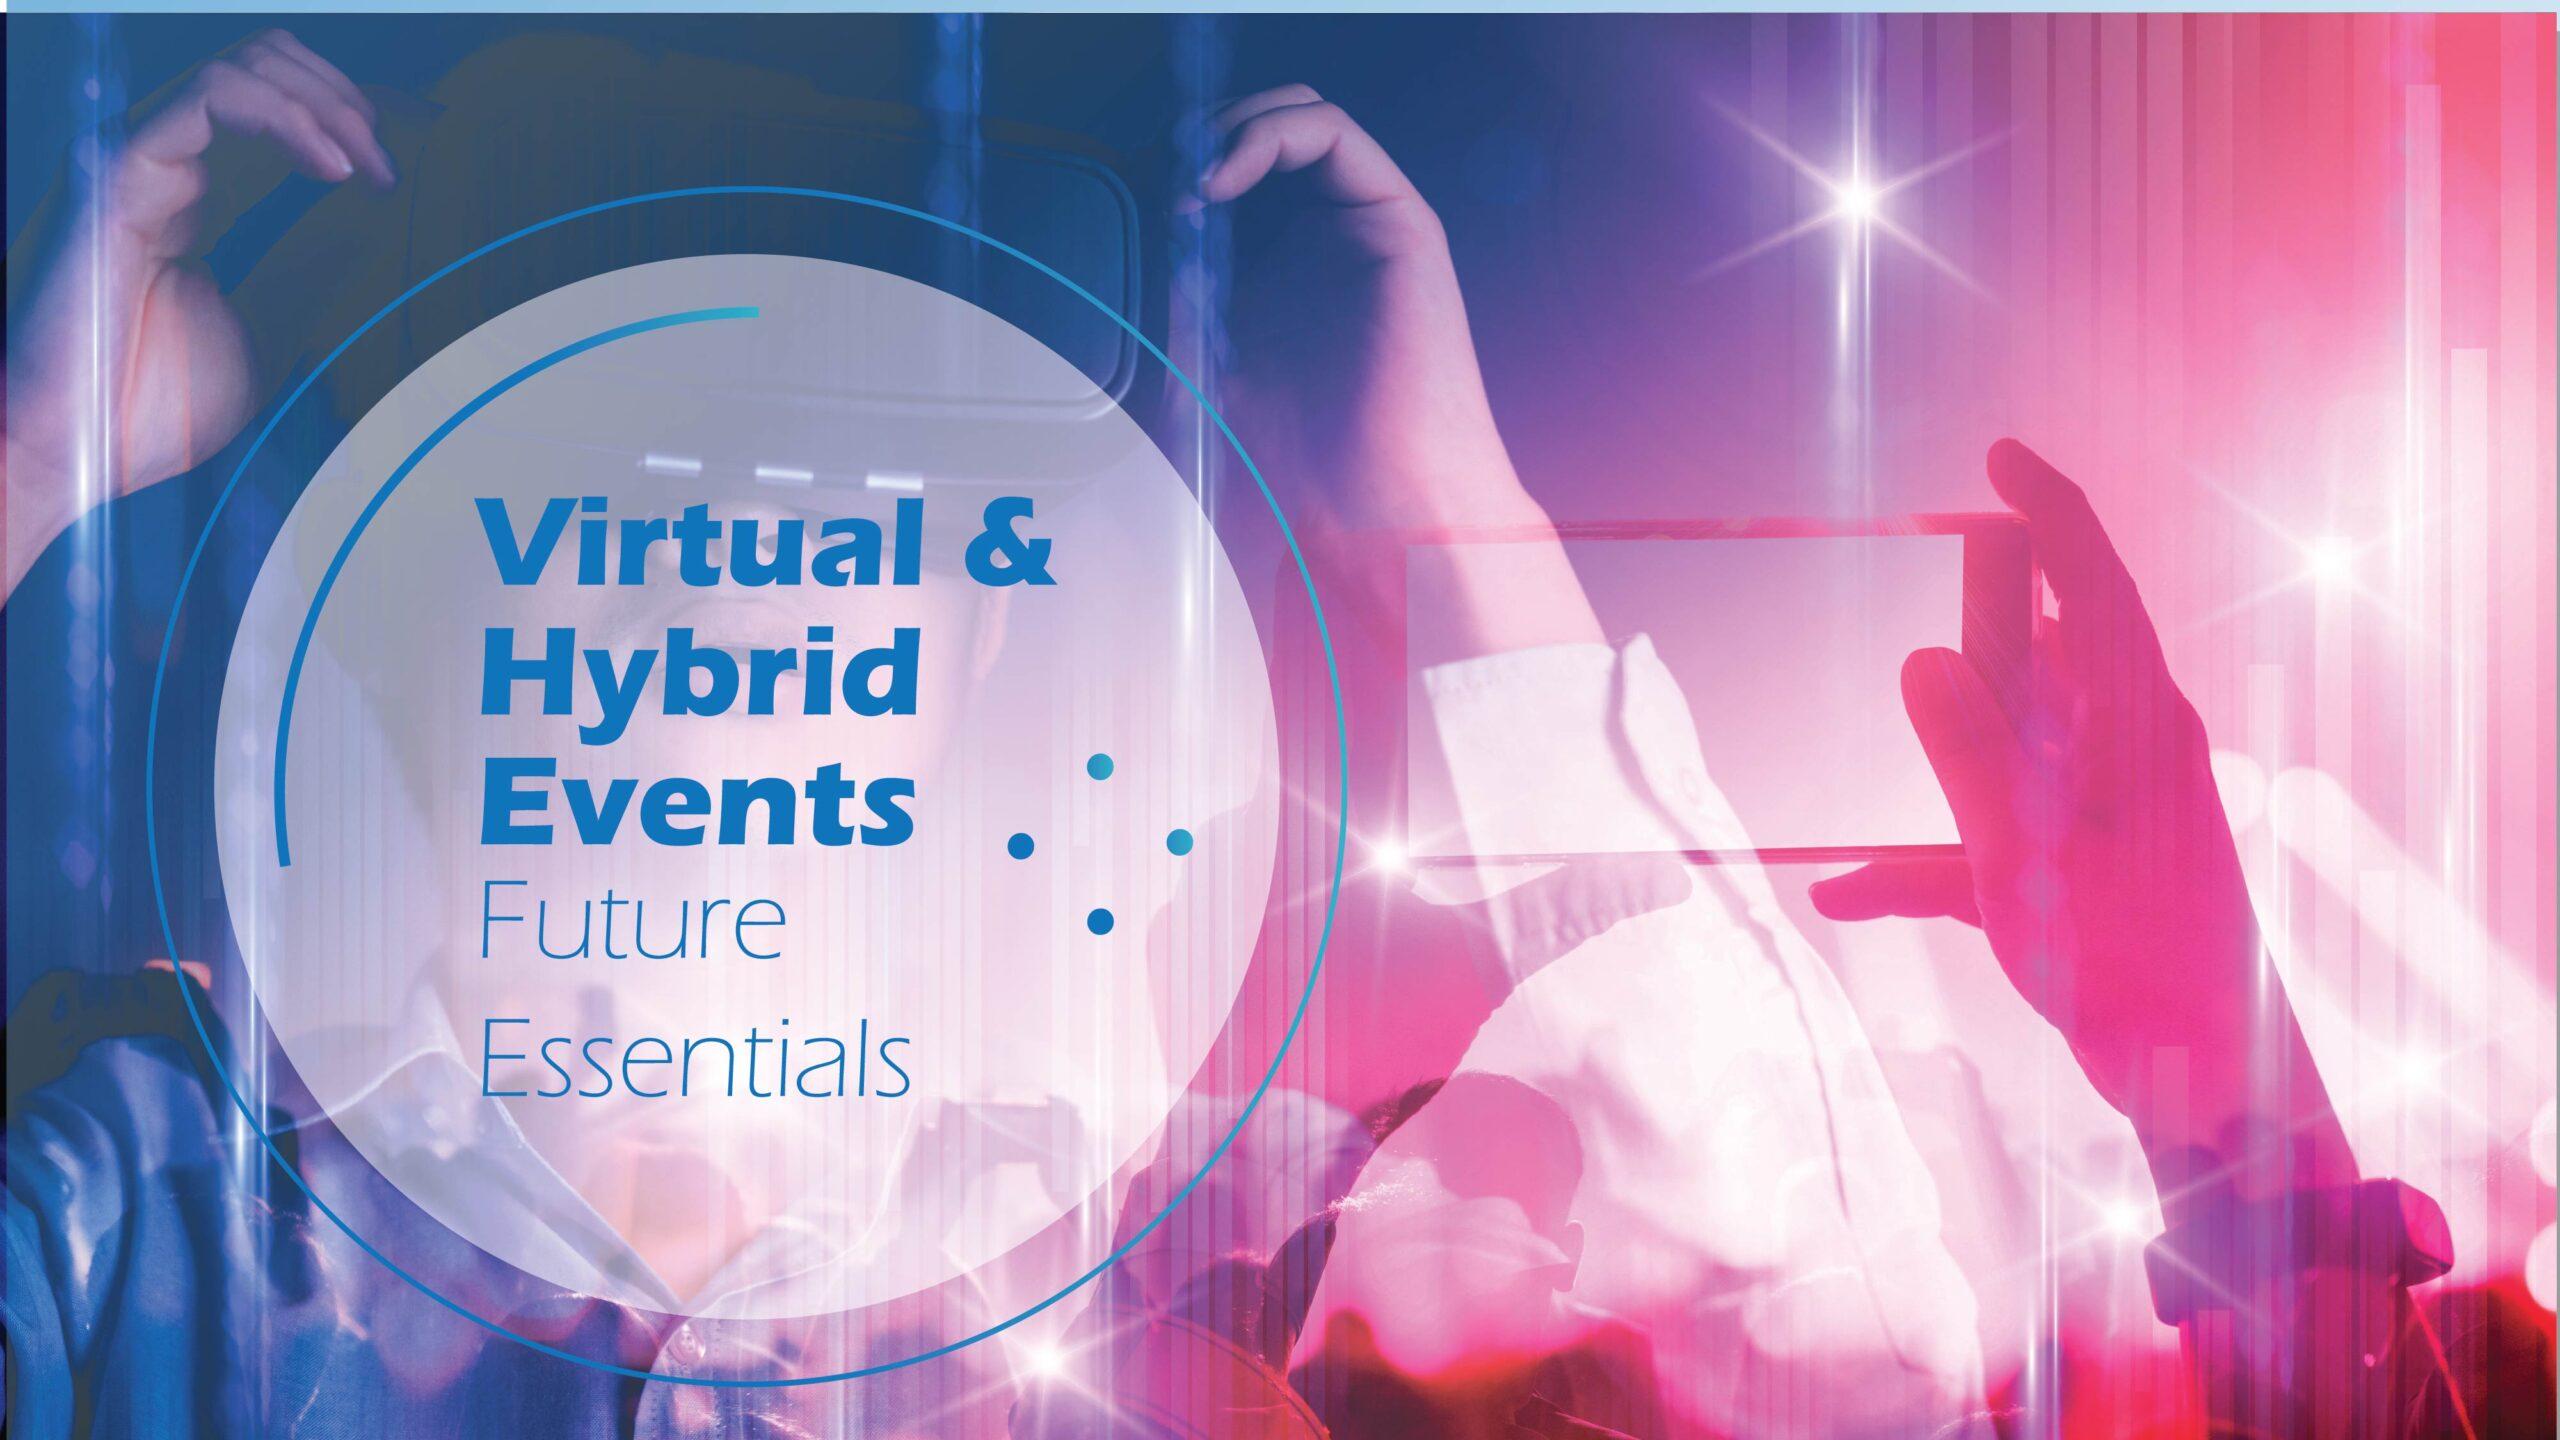 Virtual & Hybrid Events. Future Essentials